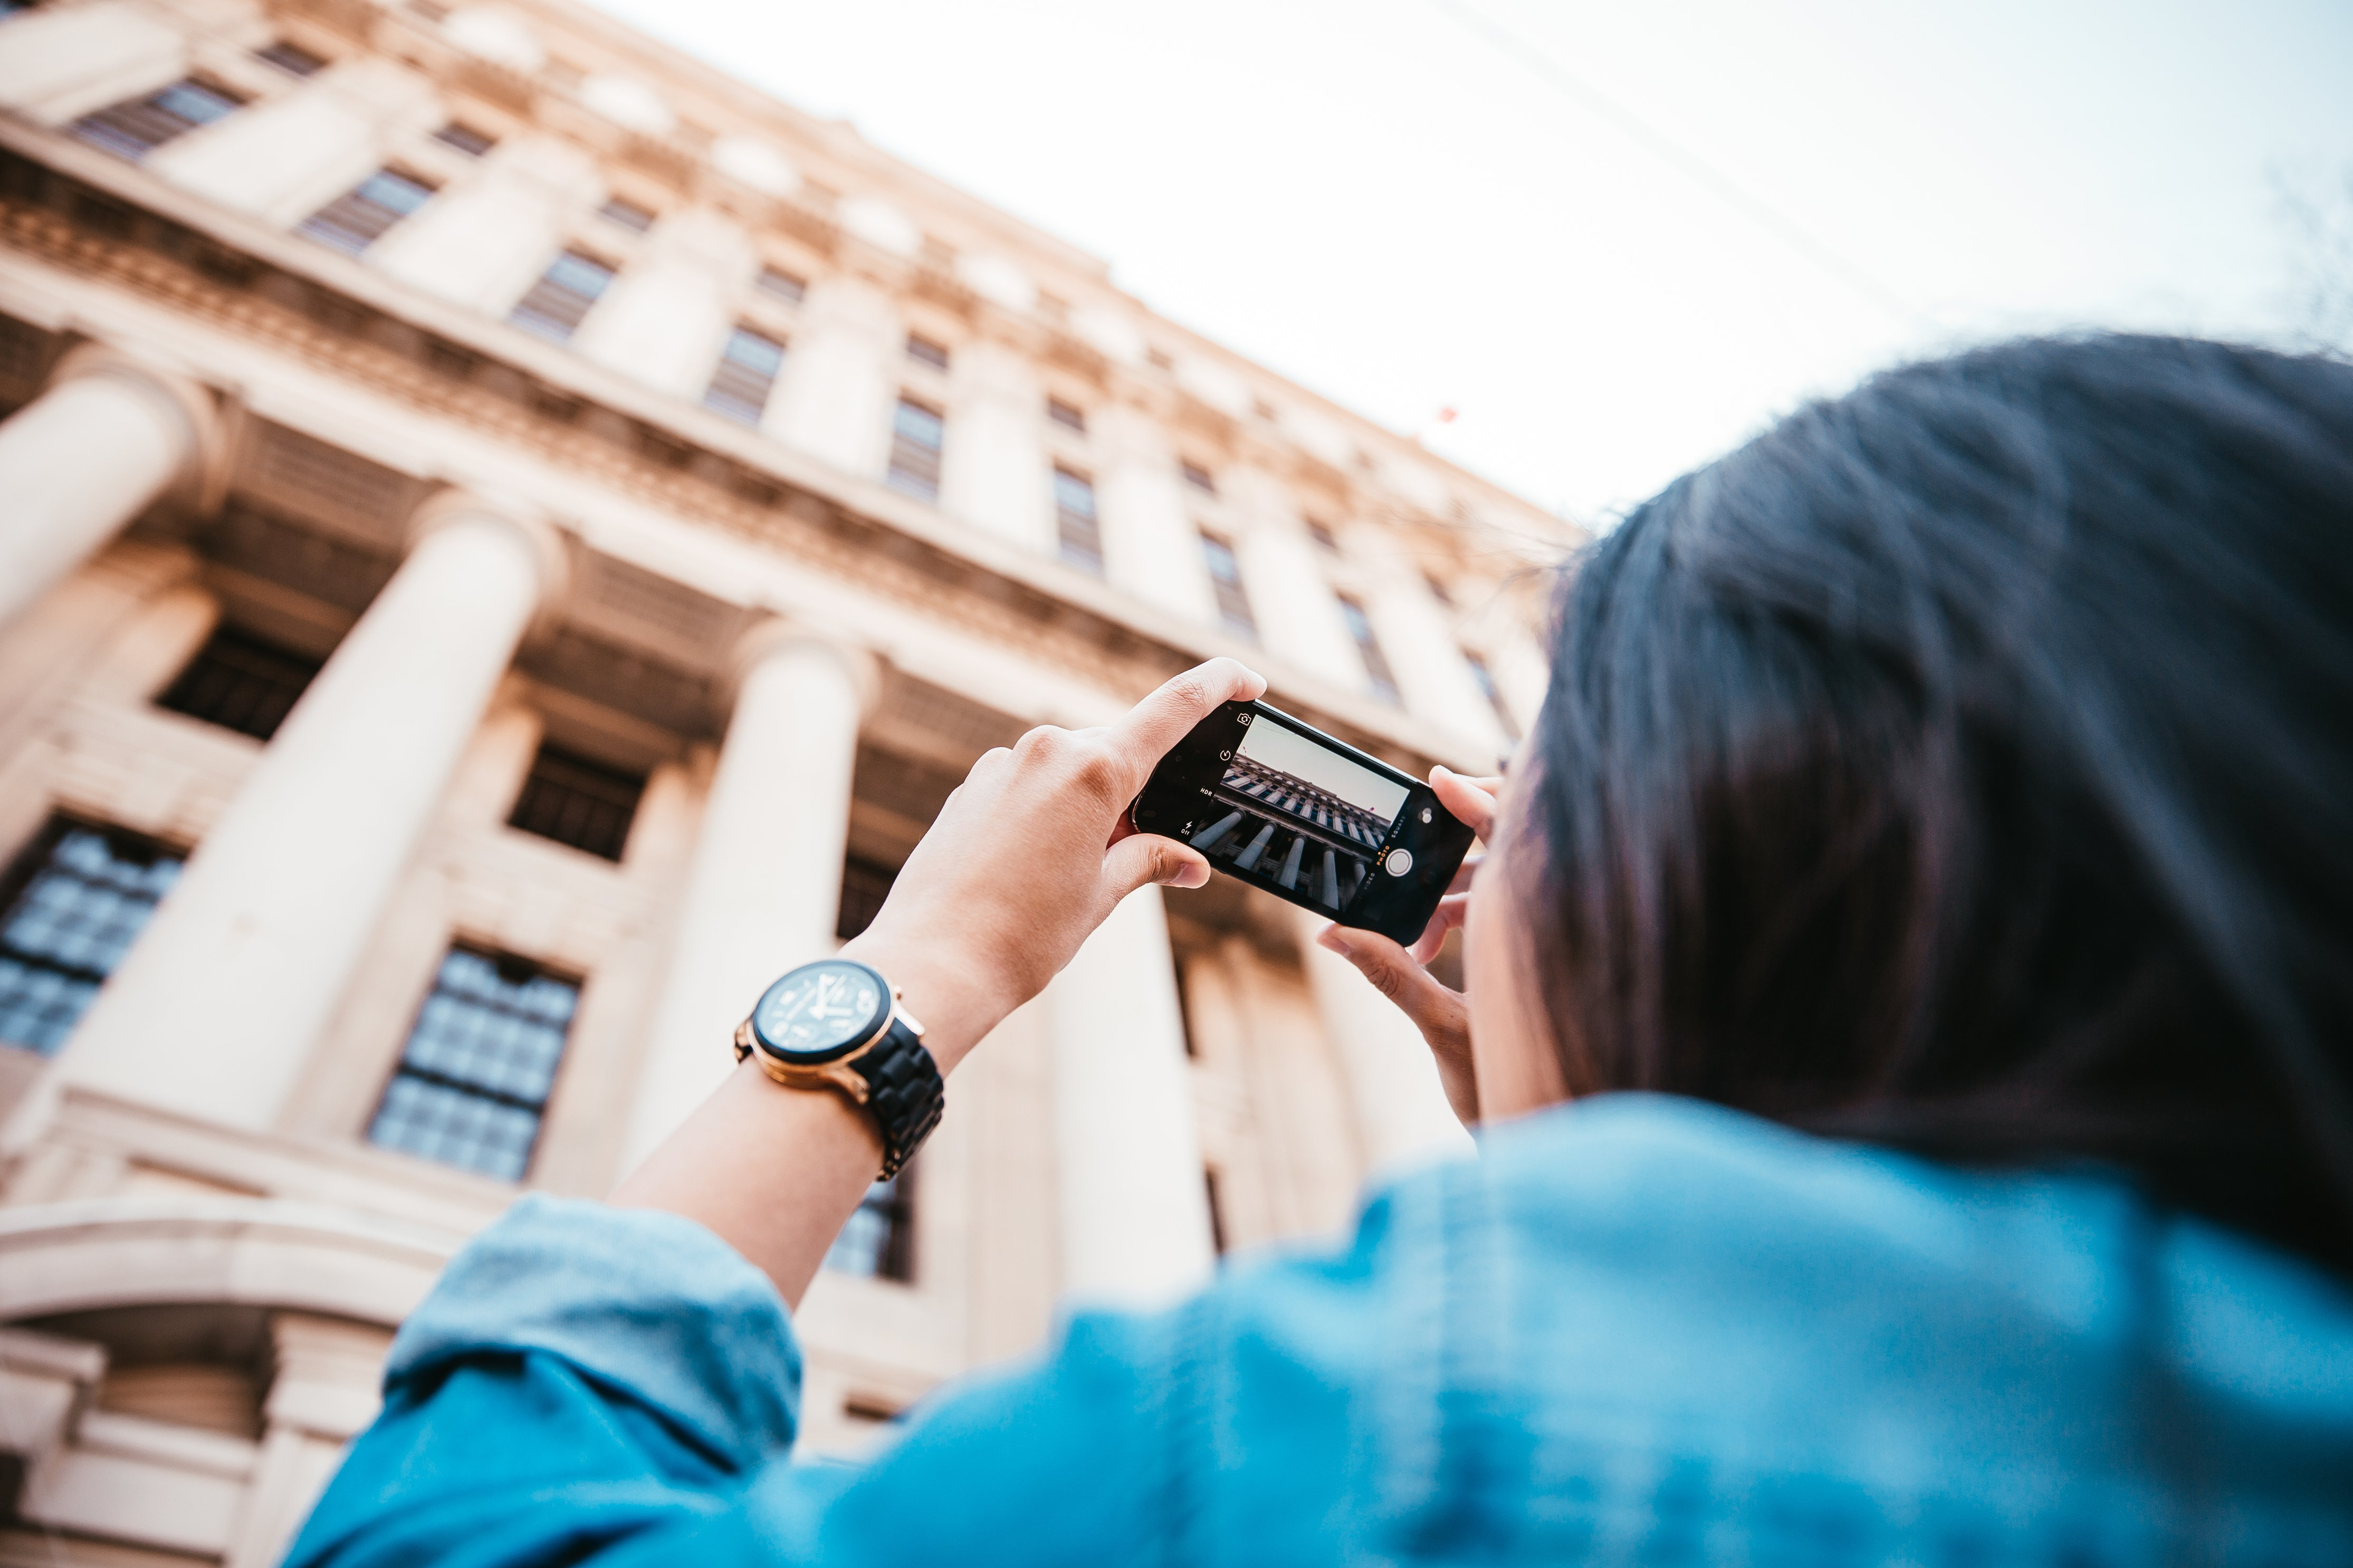 iphone-photography-architecture_premier rush cc